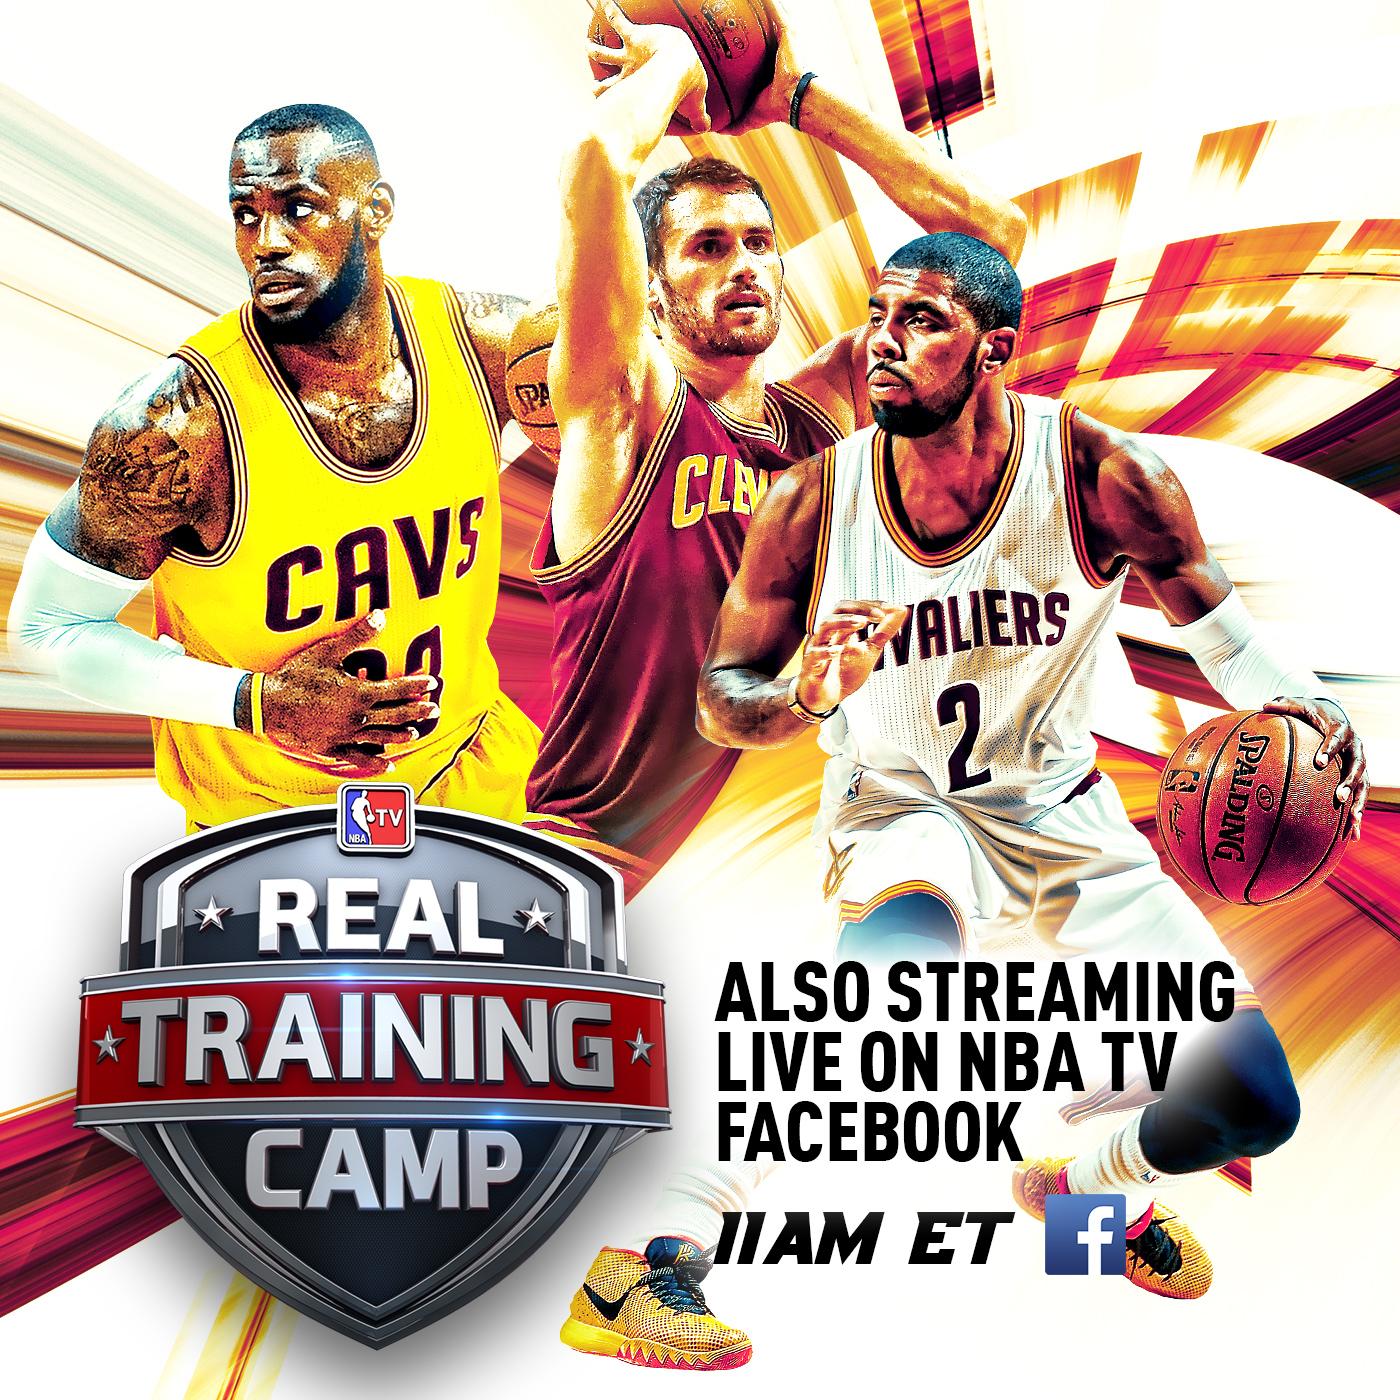 NBA Digital Hosts First Live Sports Simulcast on Facebook